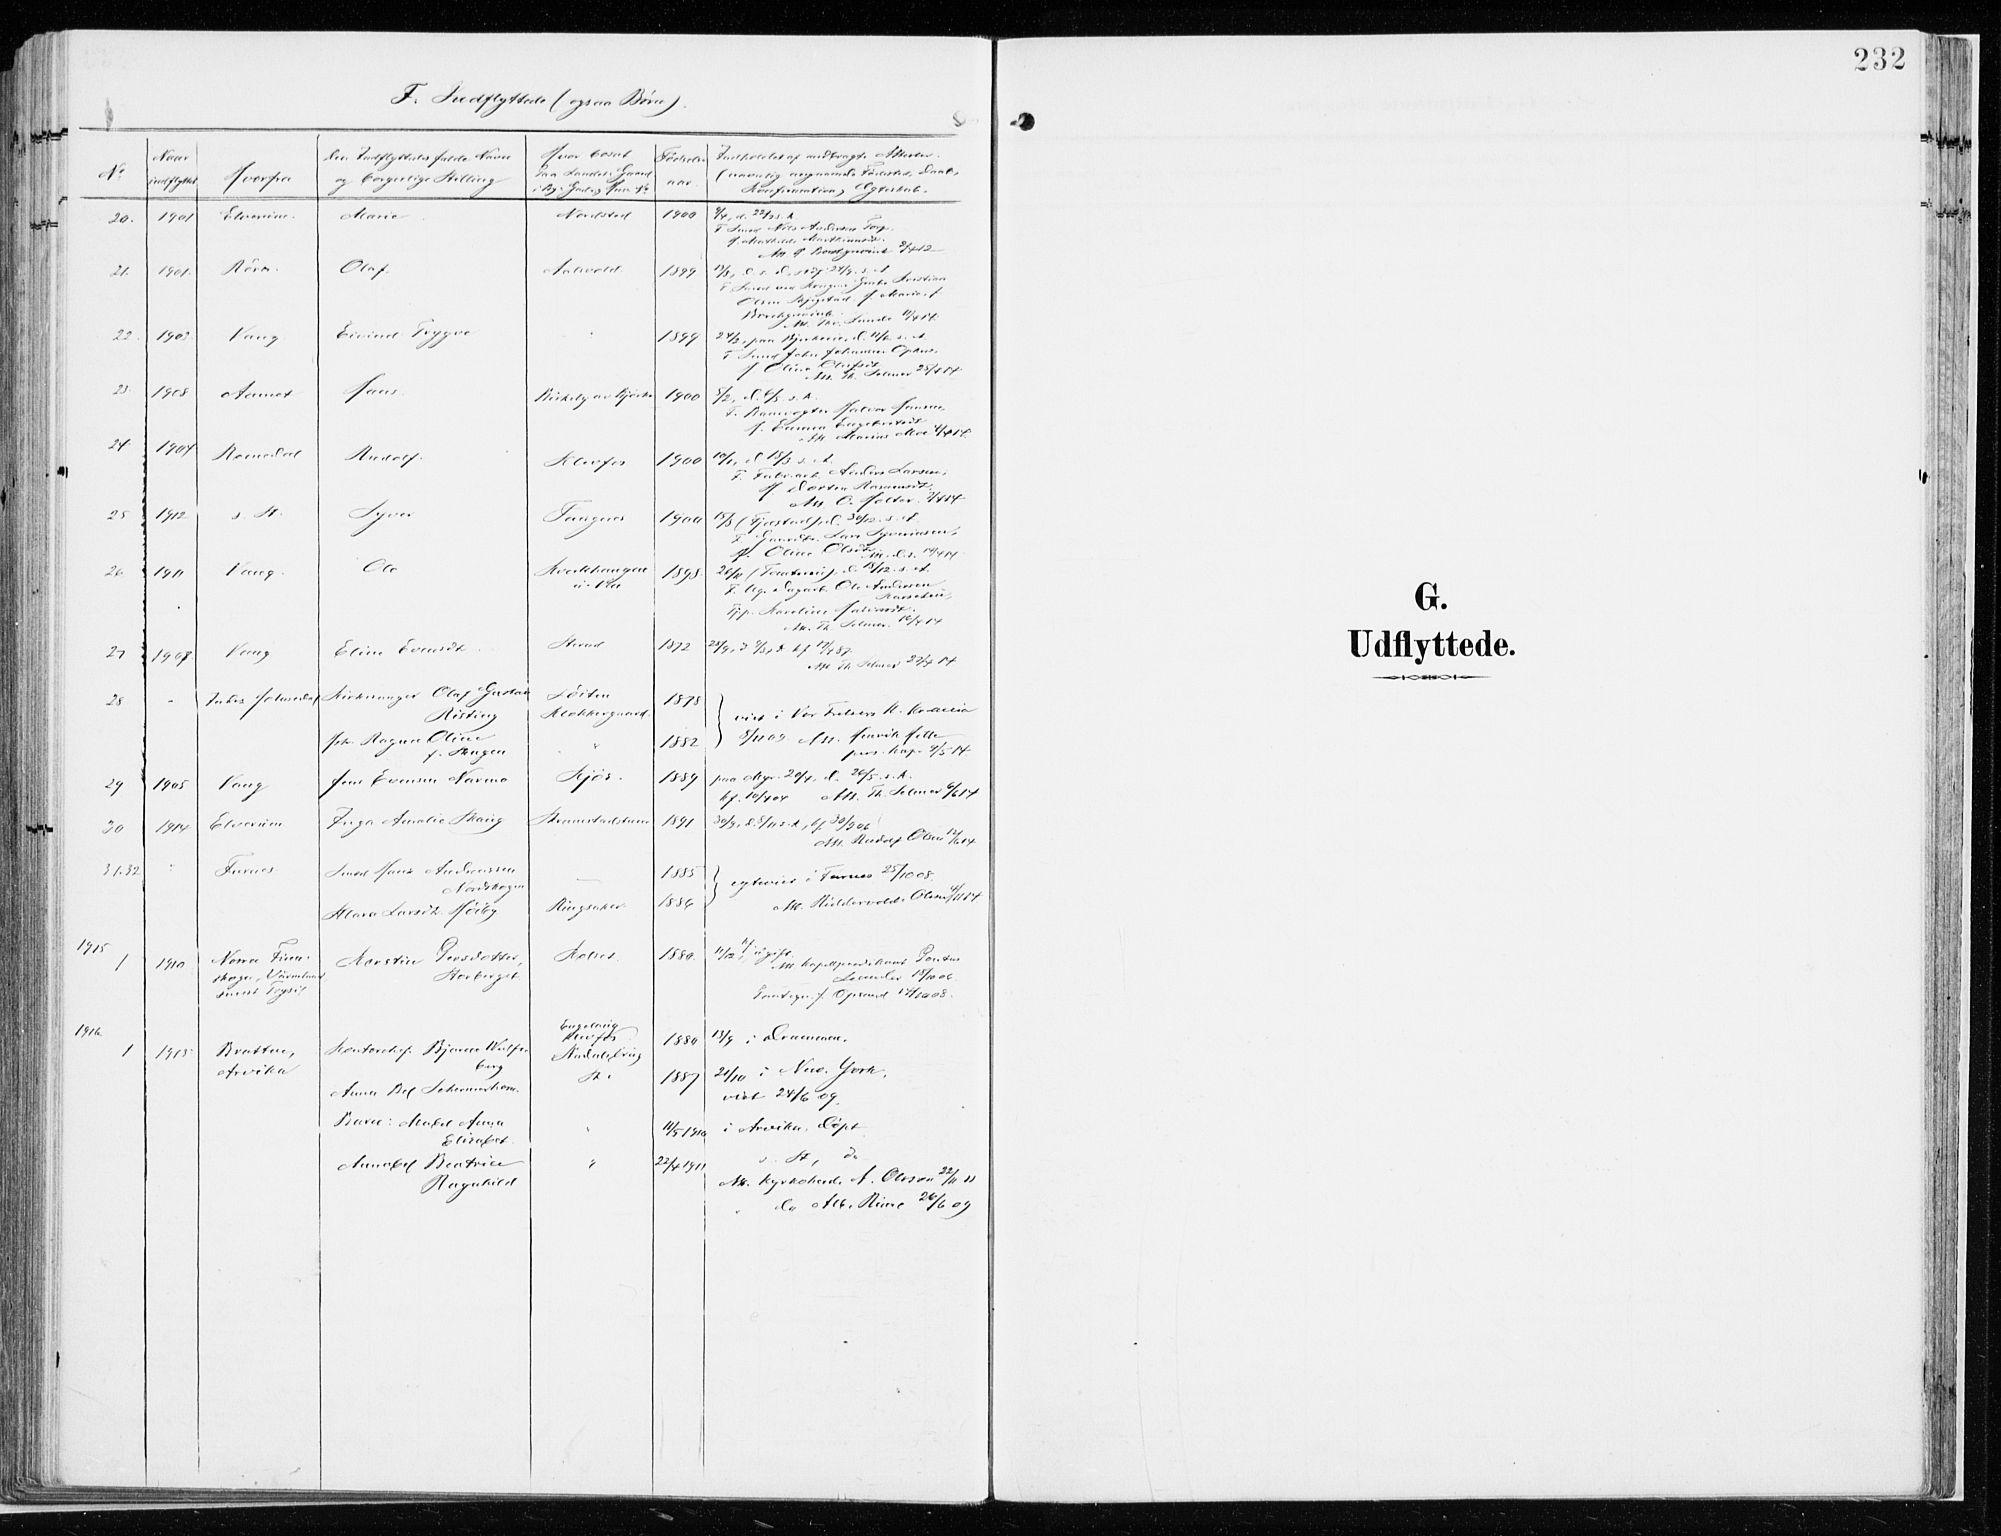 SAH, Løten prestekontor, K/Ka/L0011: Ministerialbok nr. 11, 1908-1917, s. 232